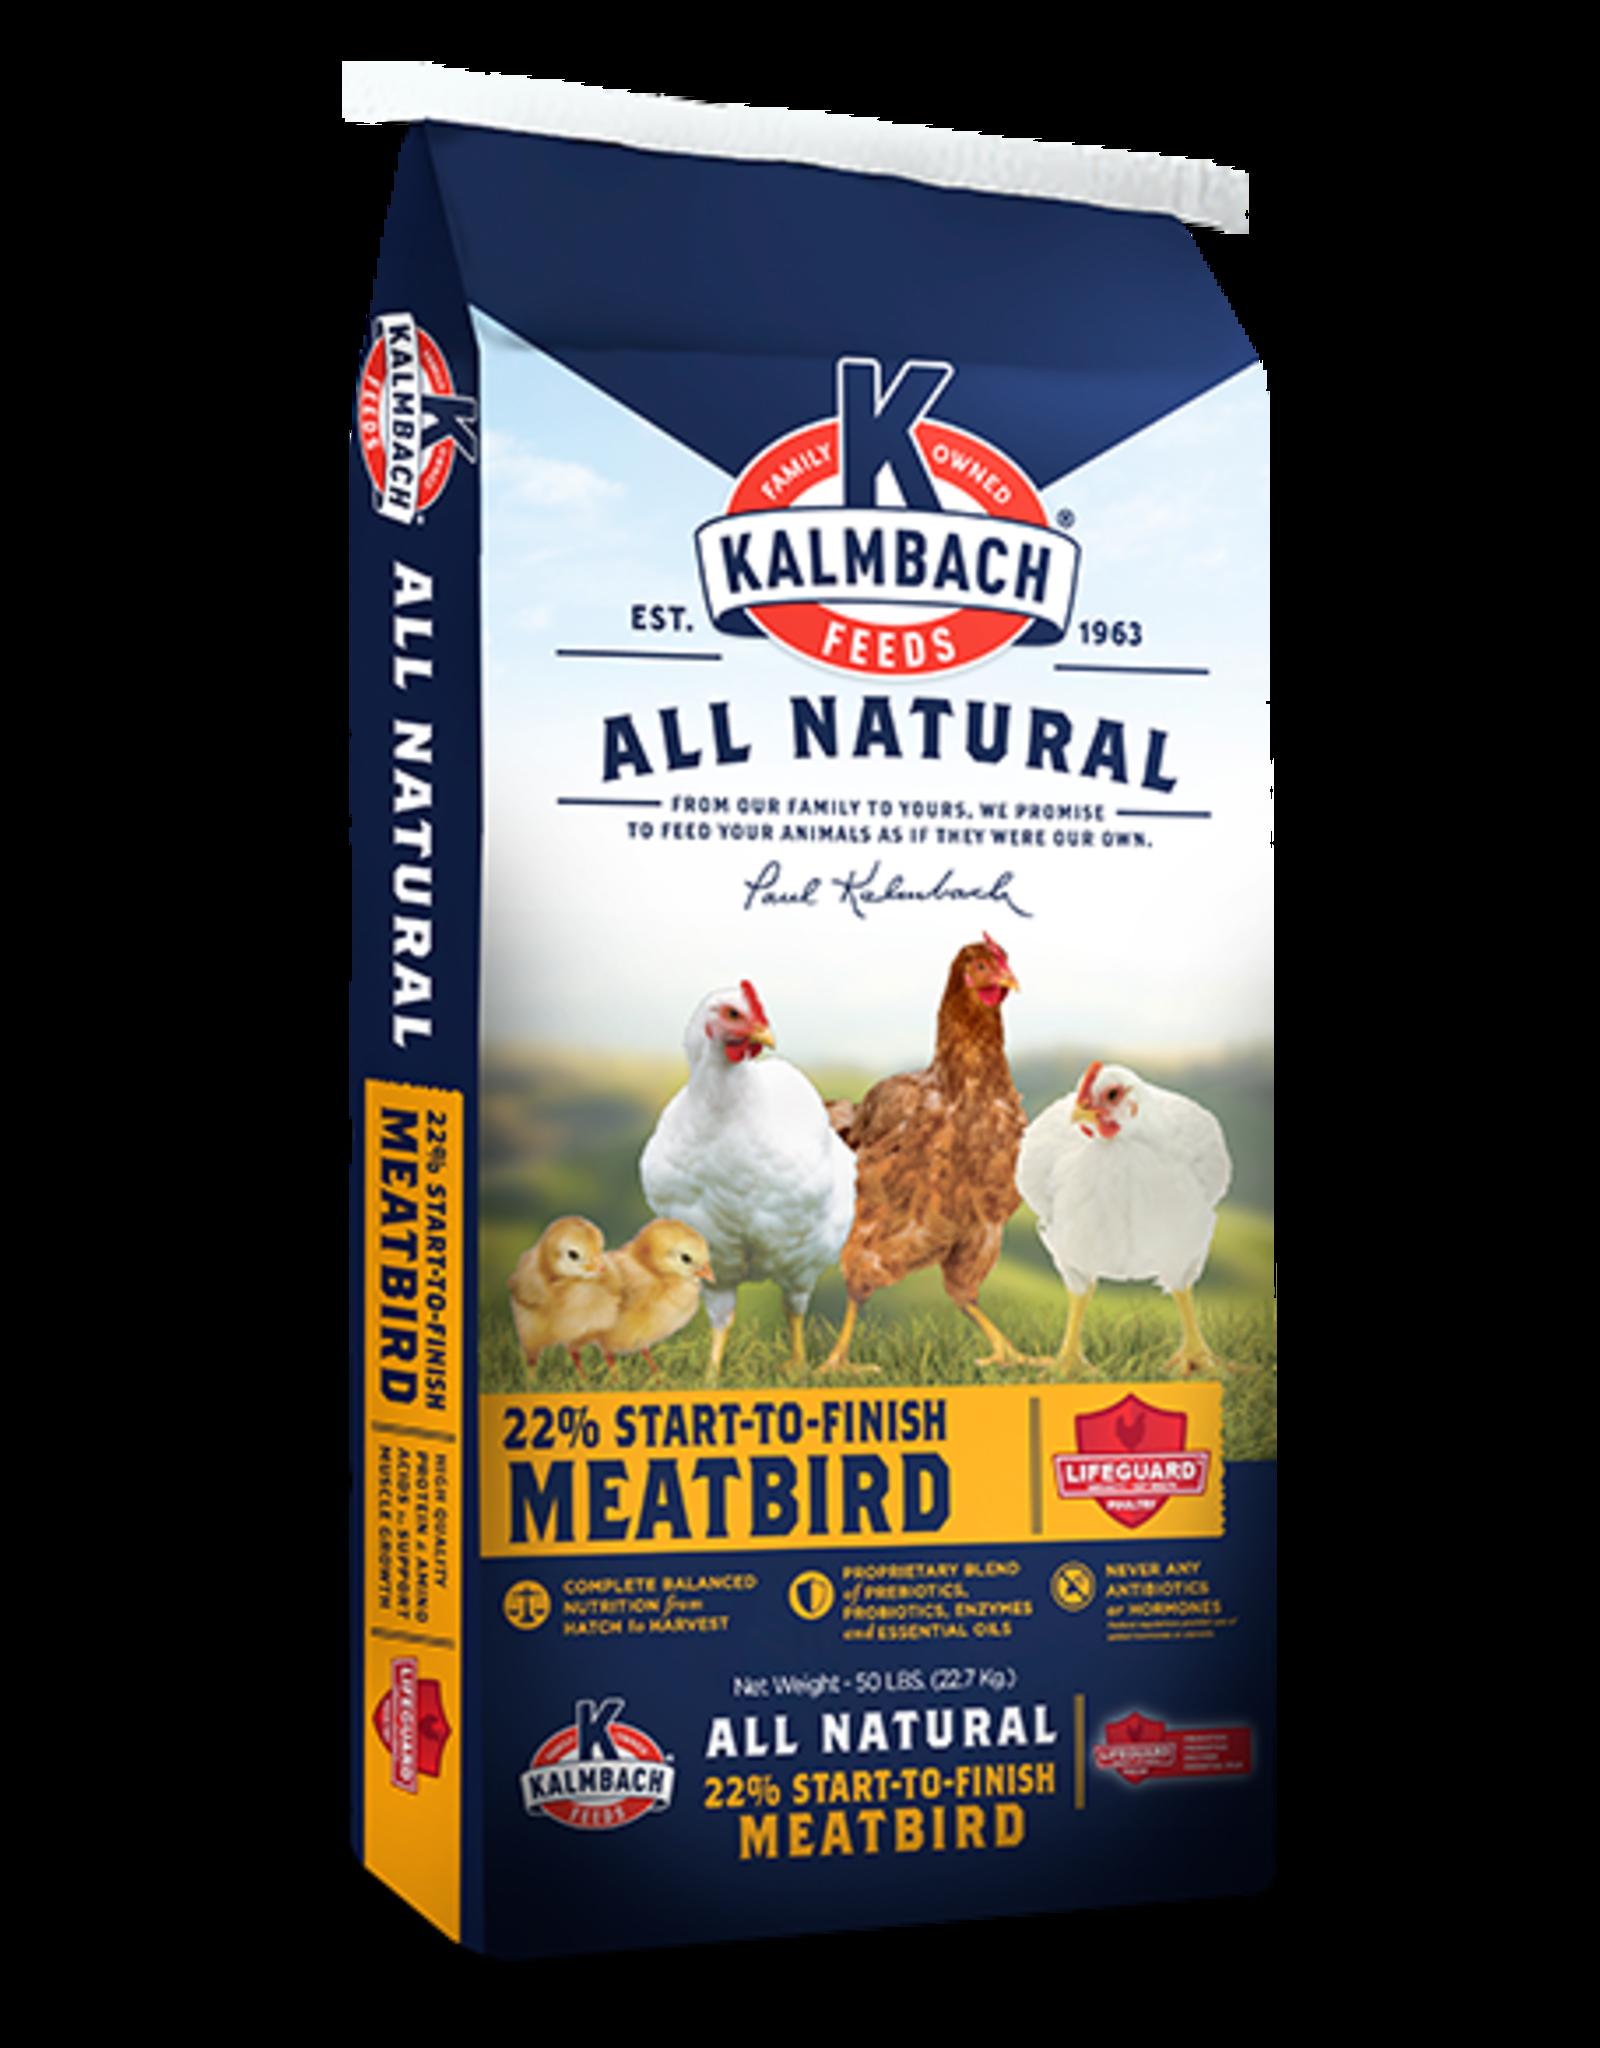 Kalmbach N1039C 22% Start-To-Finish Meatbird